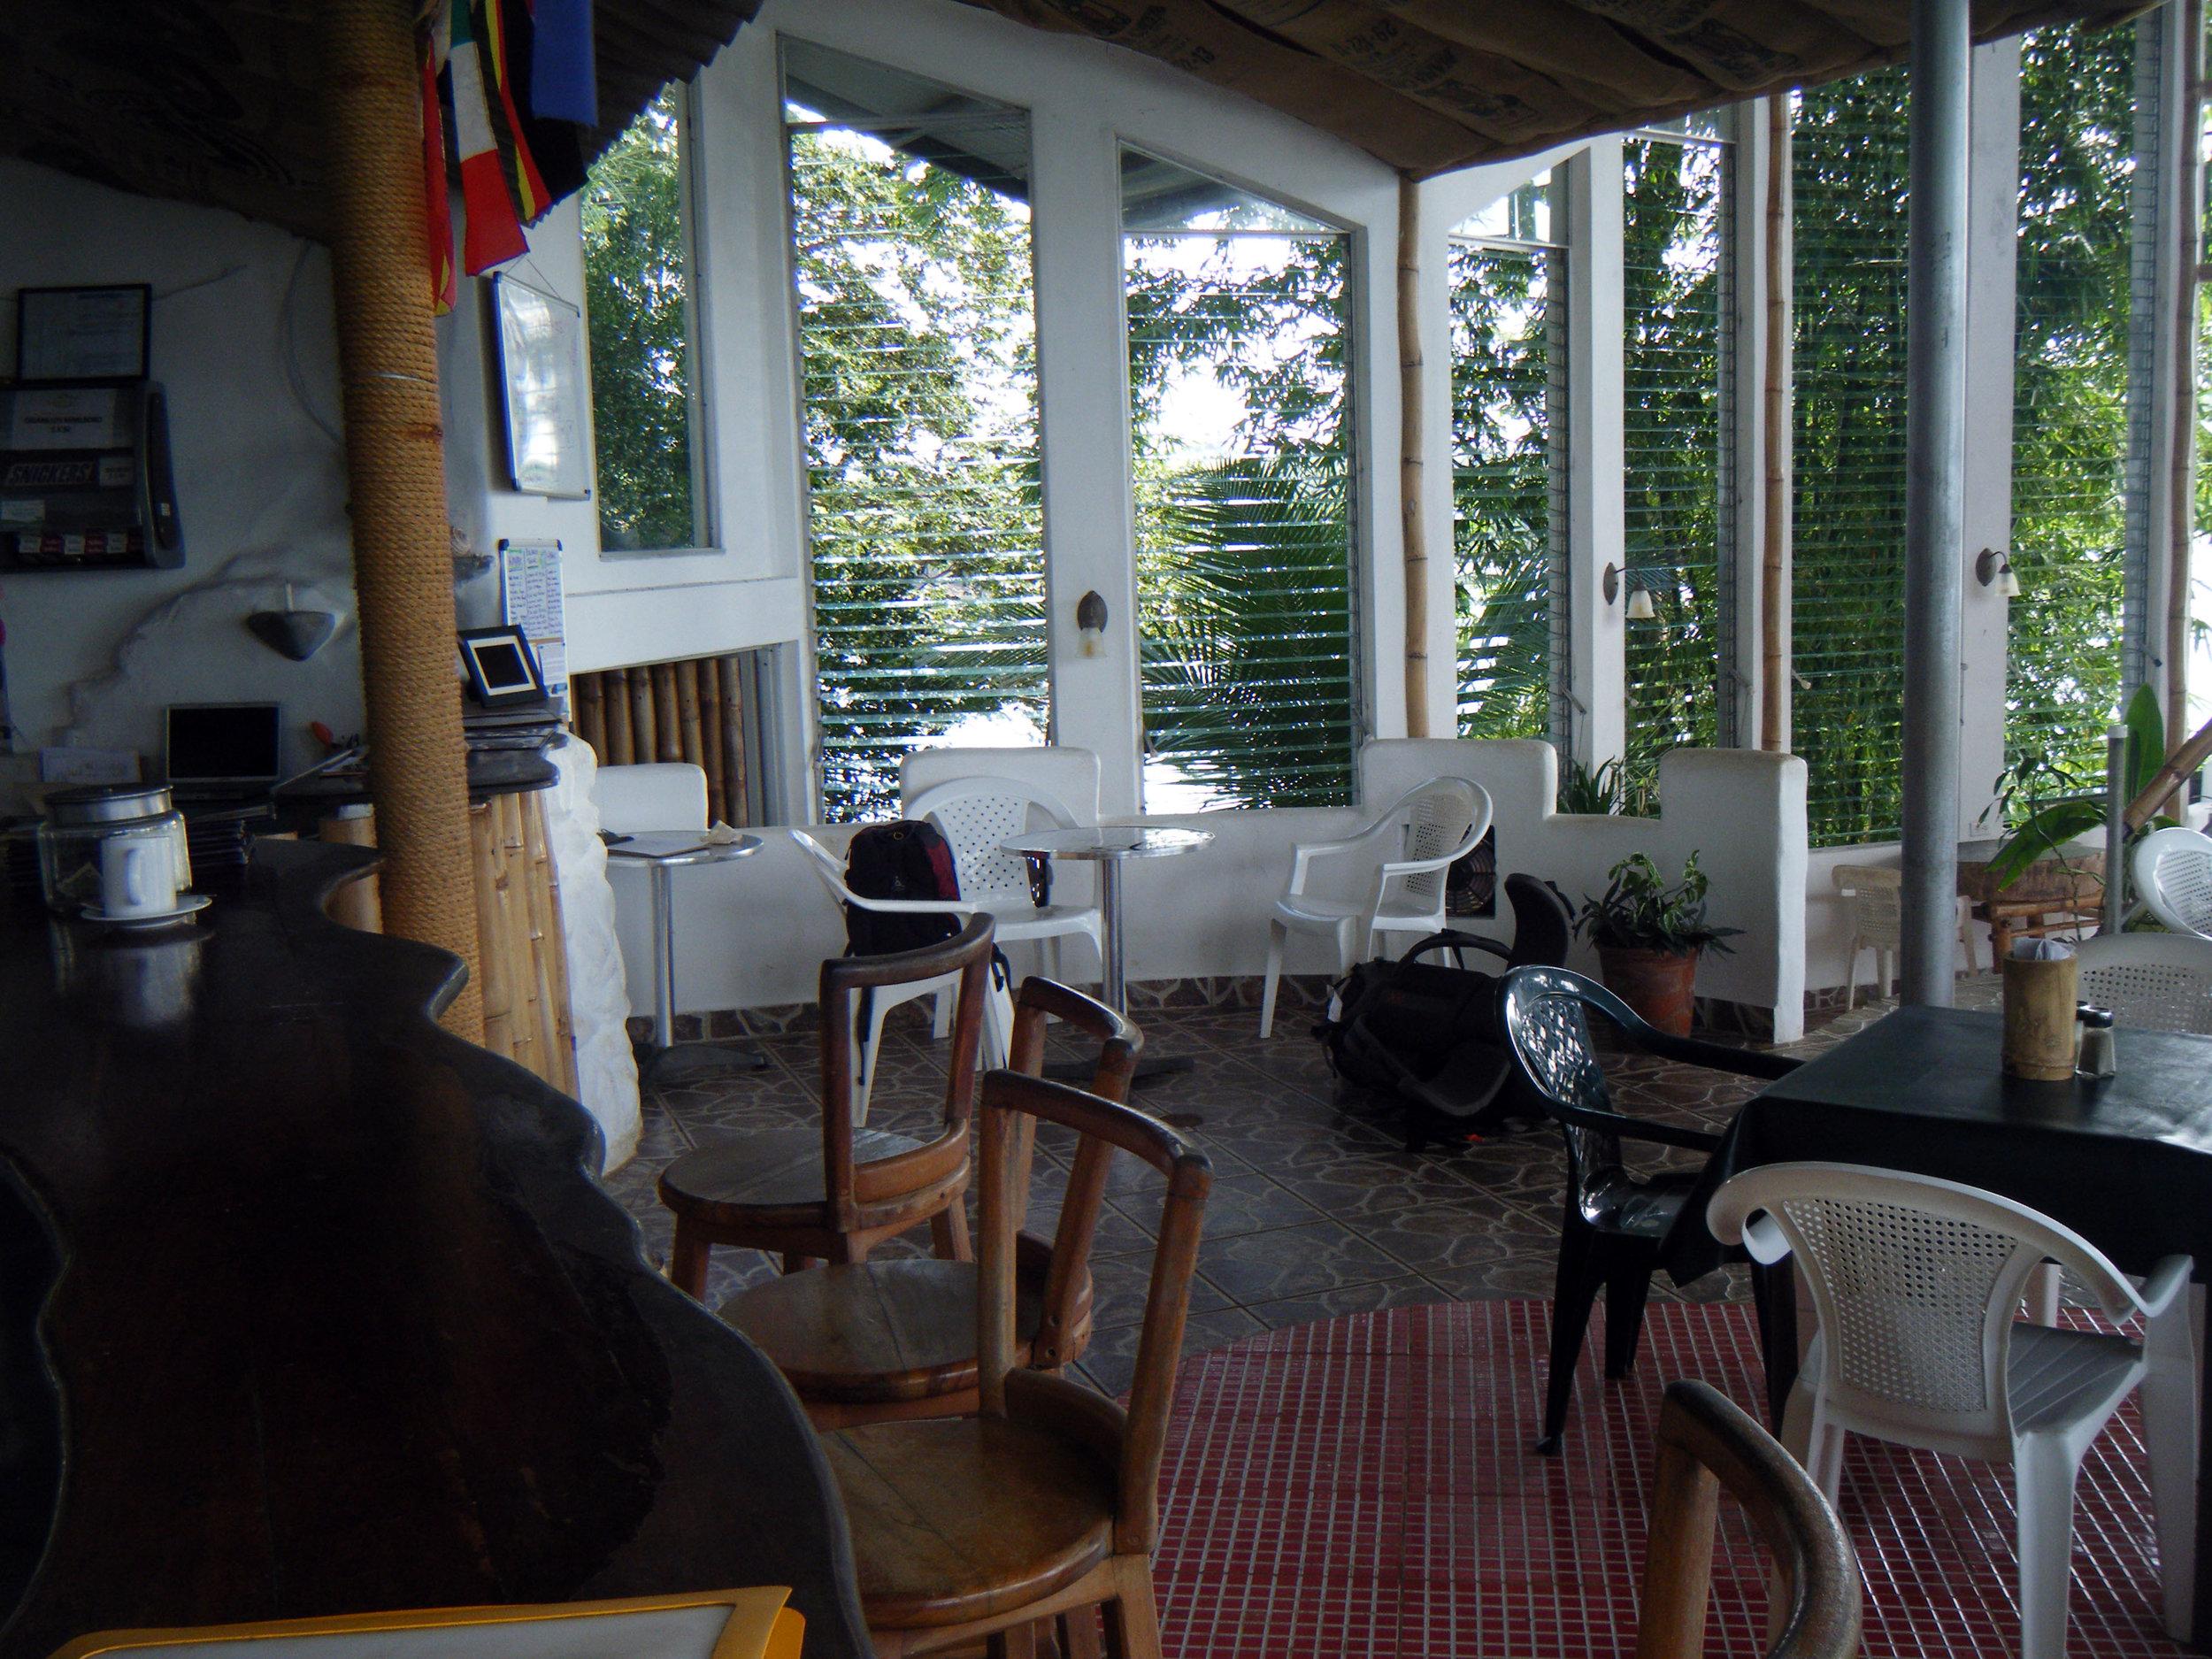 Hotel Boca Brava 7-18-12.jpg